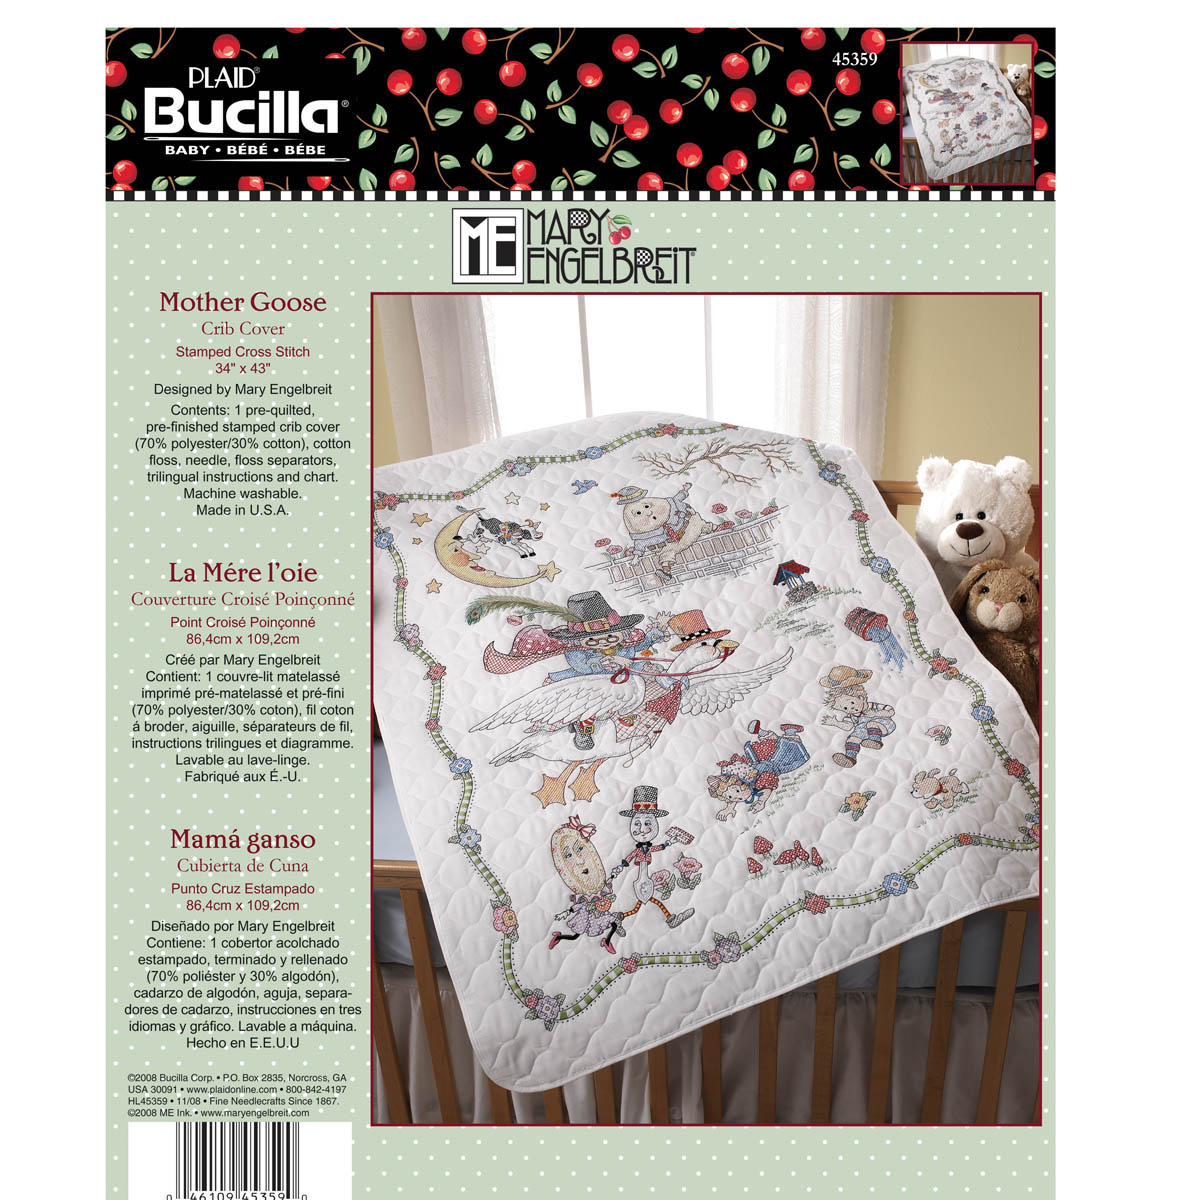 Bucilla ® Baby - Stamped Cross Stitch - Crib Ensembles - Mary Engelbreit™ - Mother Goose - Crib Cove